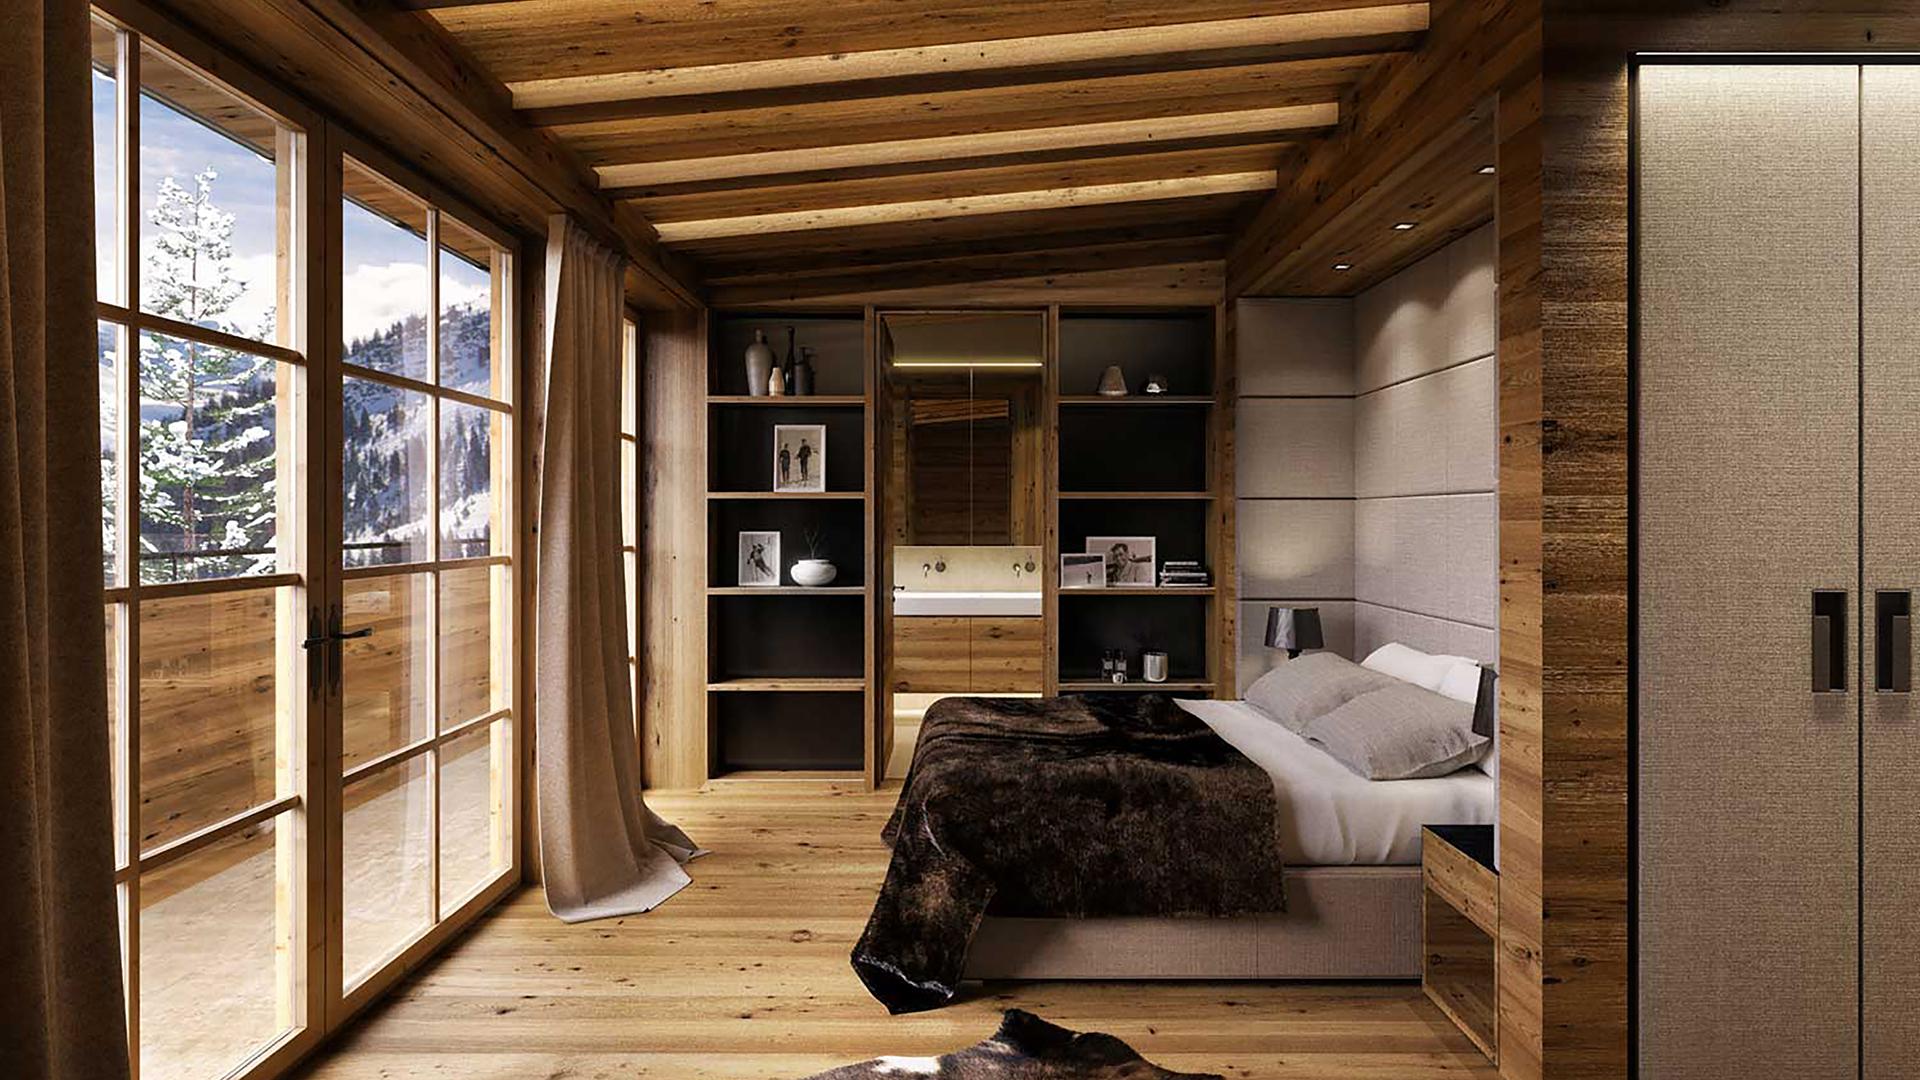 The Vorarlberg Residences Apartments, Austria